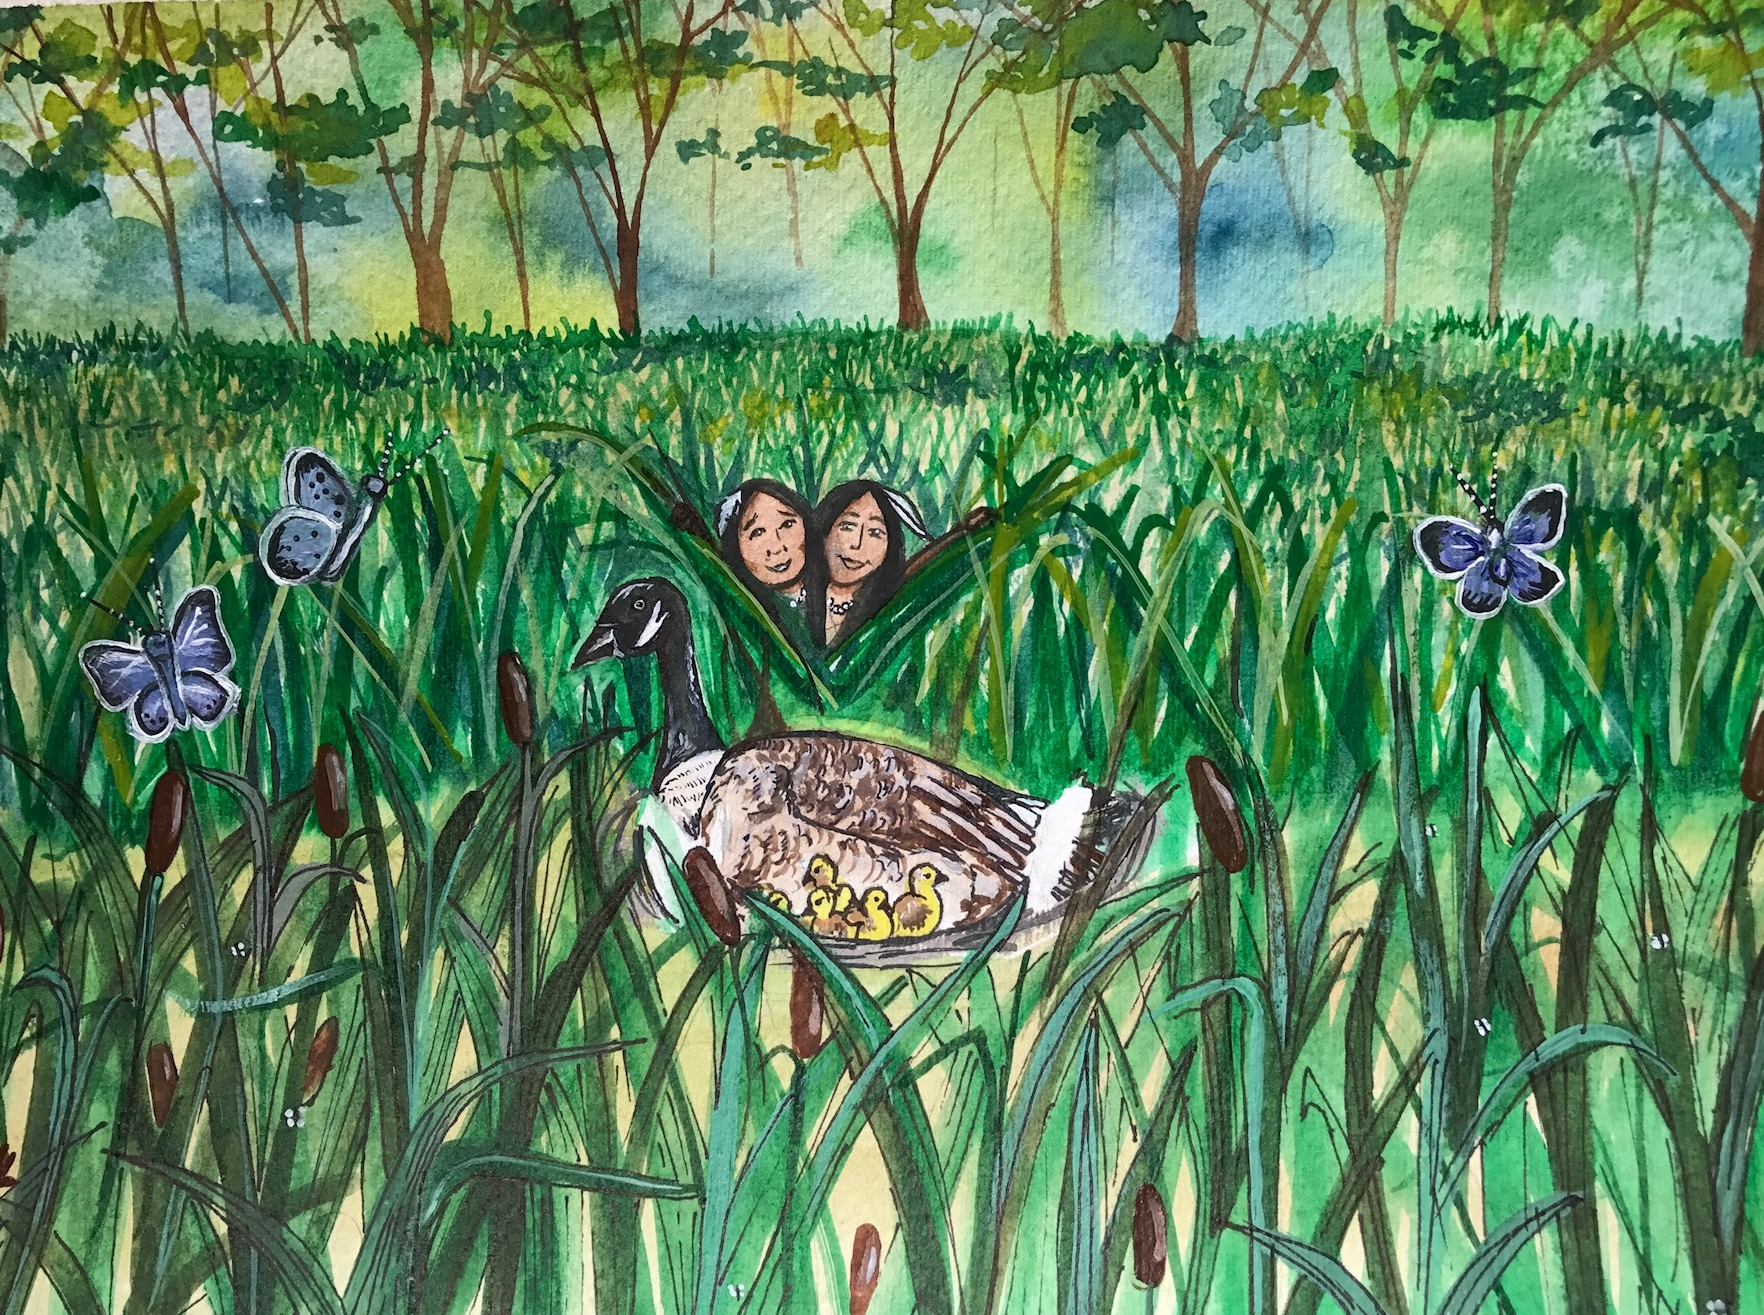 Illustration for  Kisses on the Wind  by Meg Kappel by artist and SASLLC owner Samantha Silvas